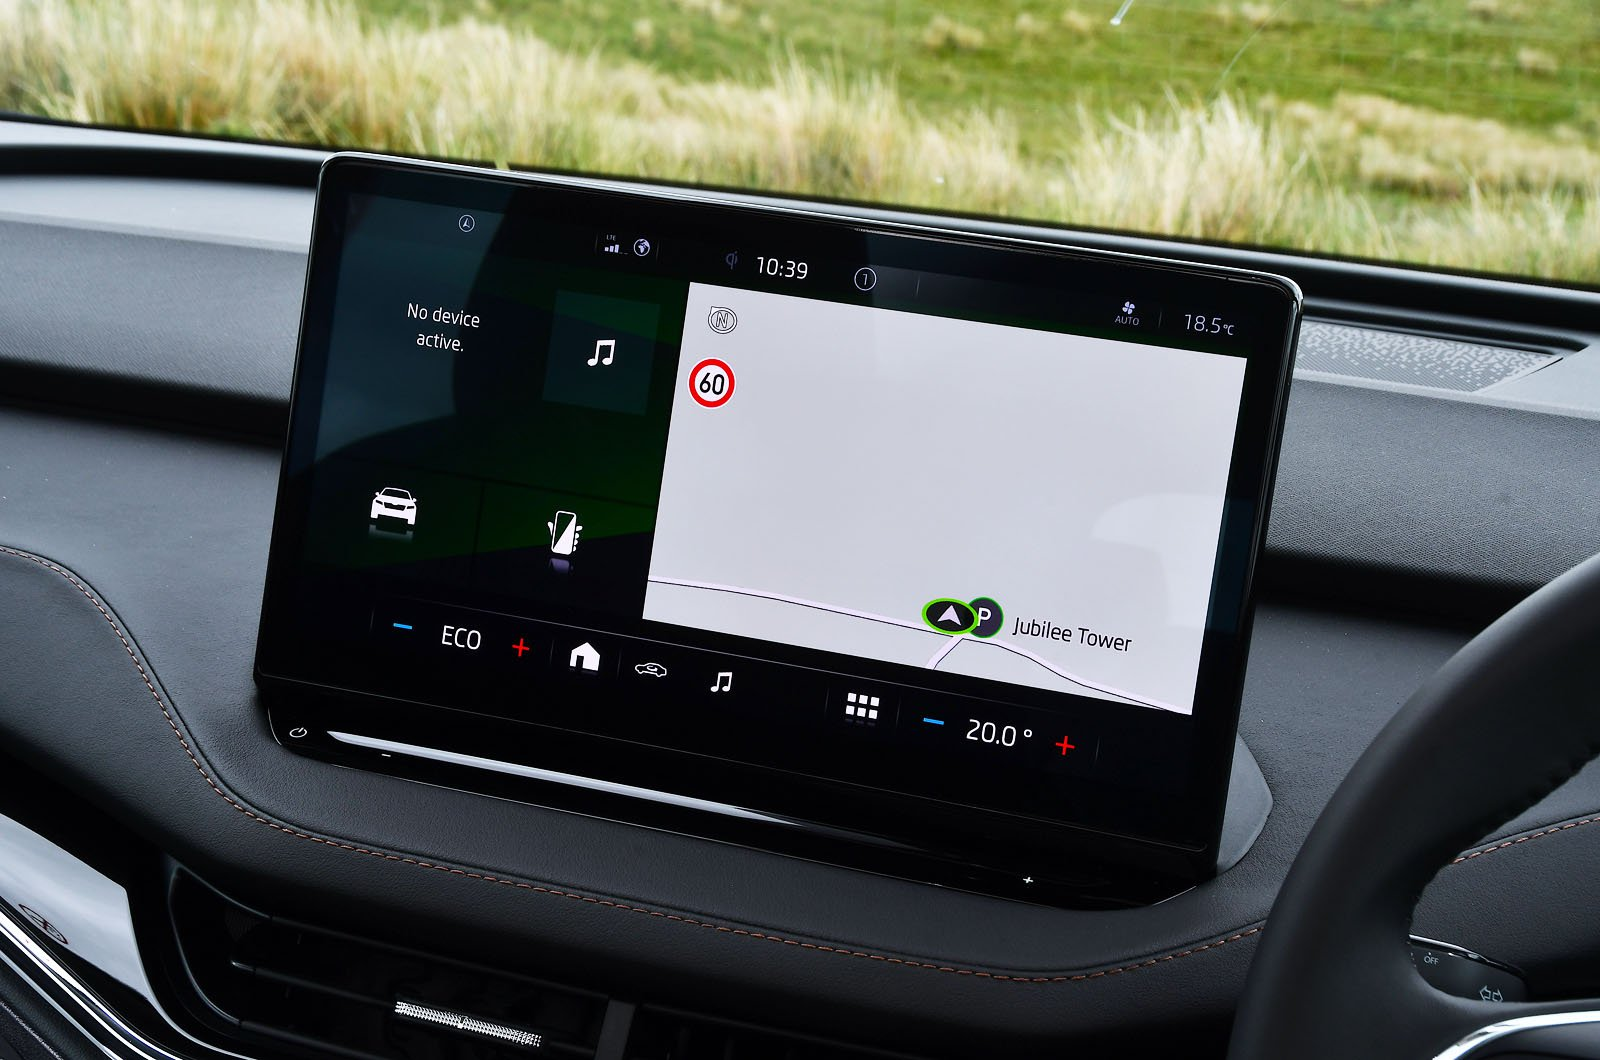 Skoda Enyaq iV 2021 touchscreen